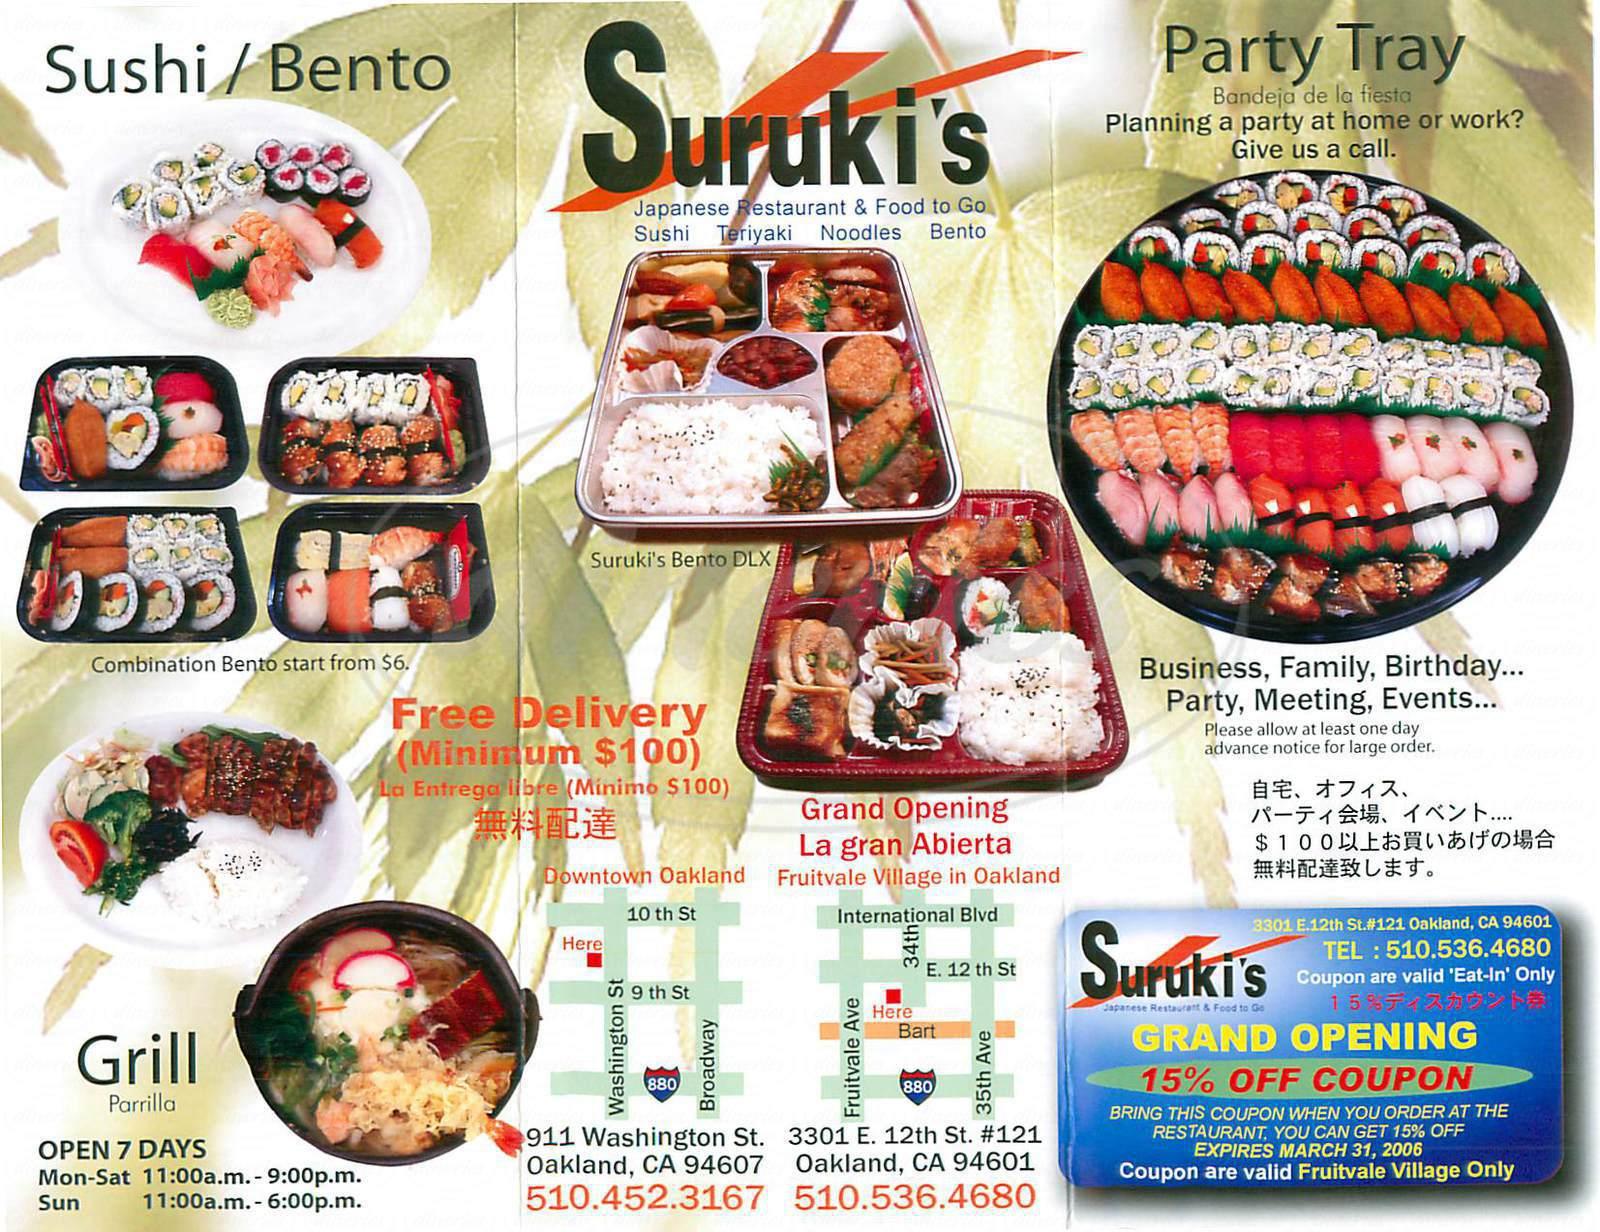 menu for Surukis